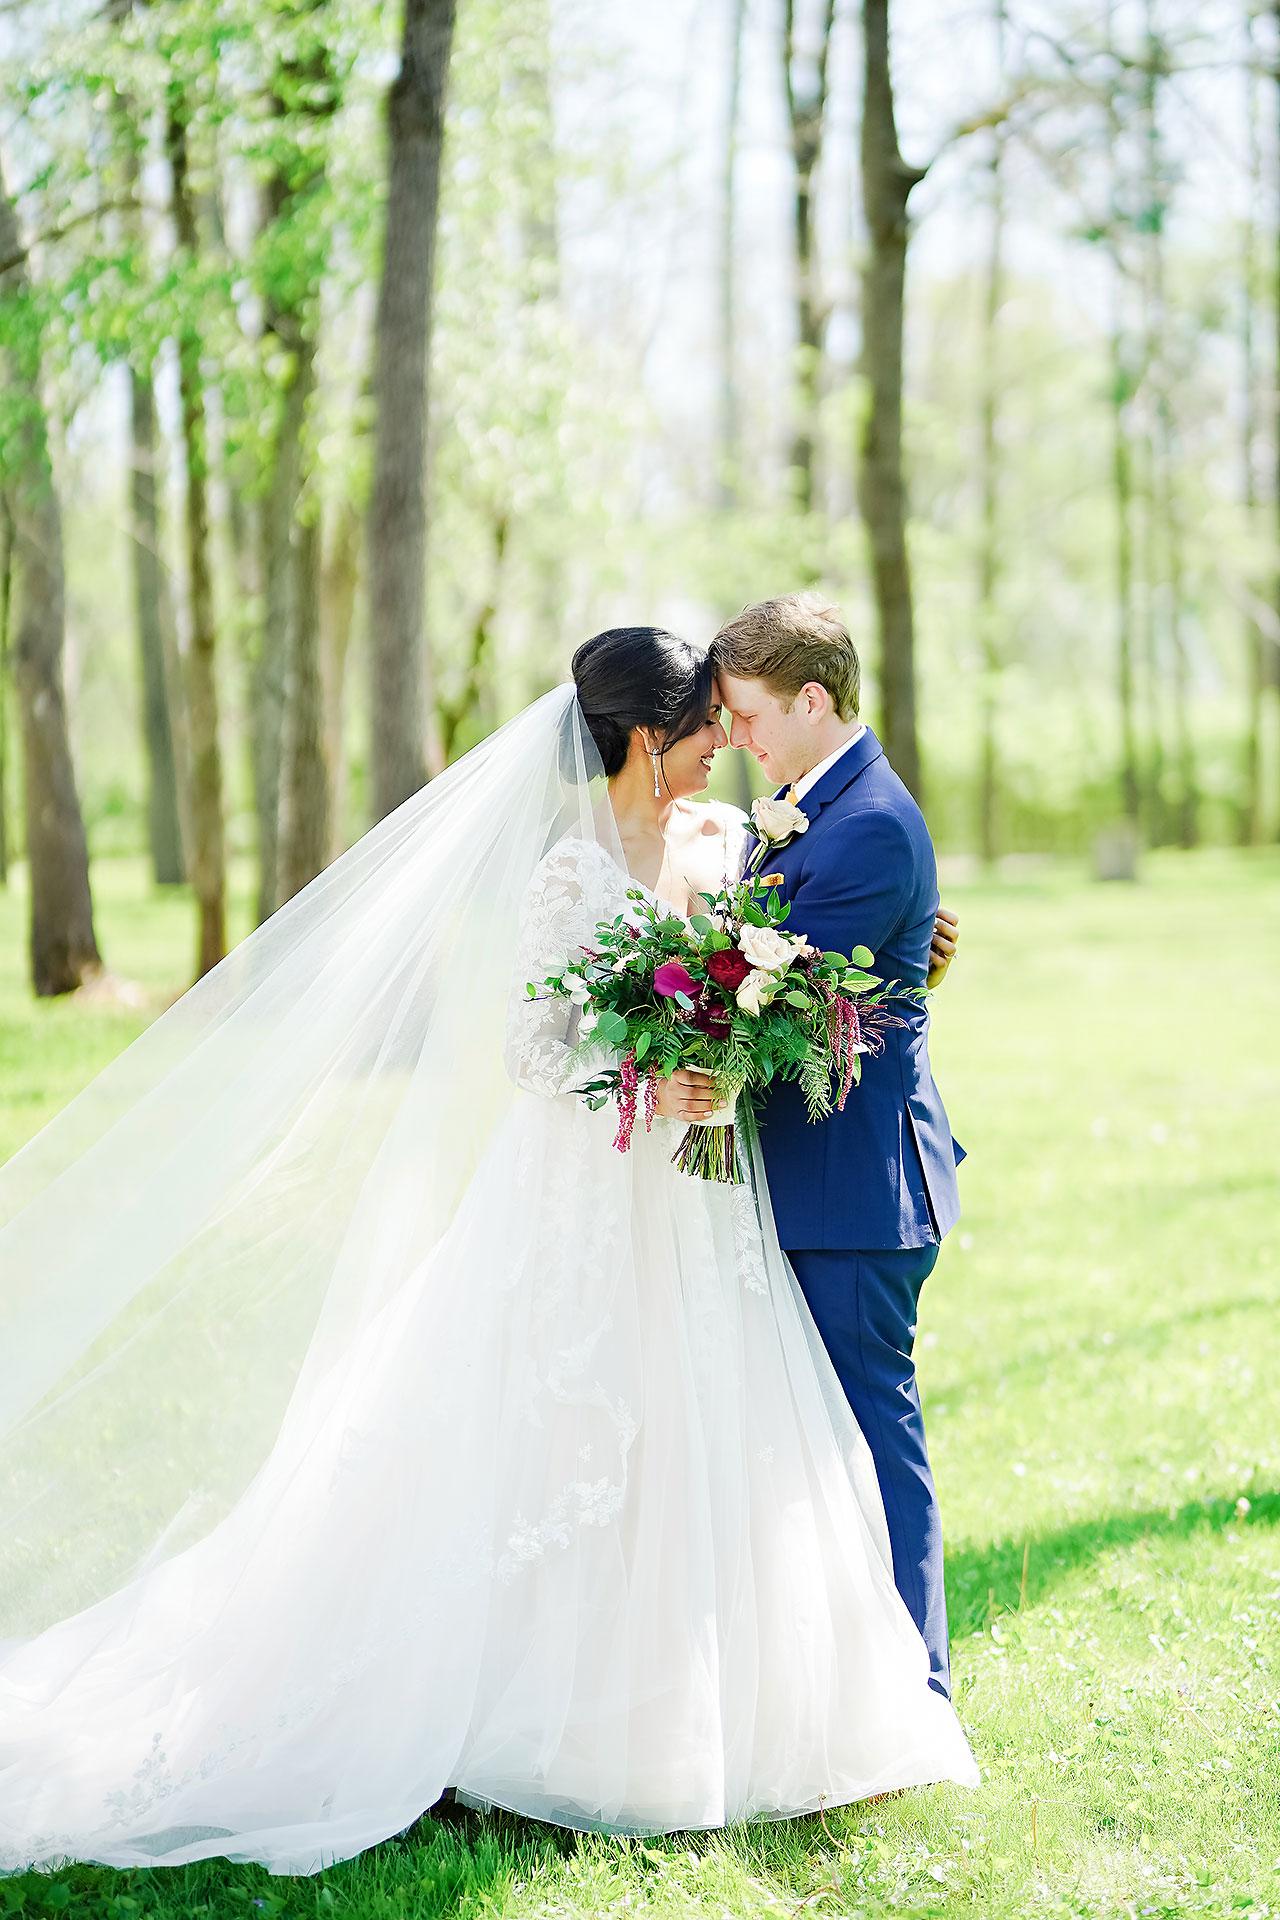 Nadia Parker Black Iris Estate Carmel Indiana Wedding May 2021 061